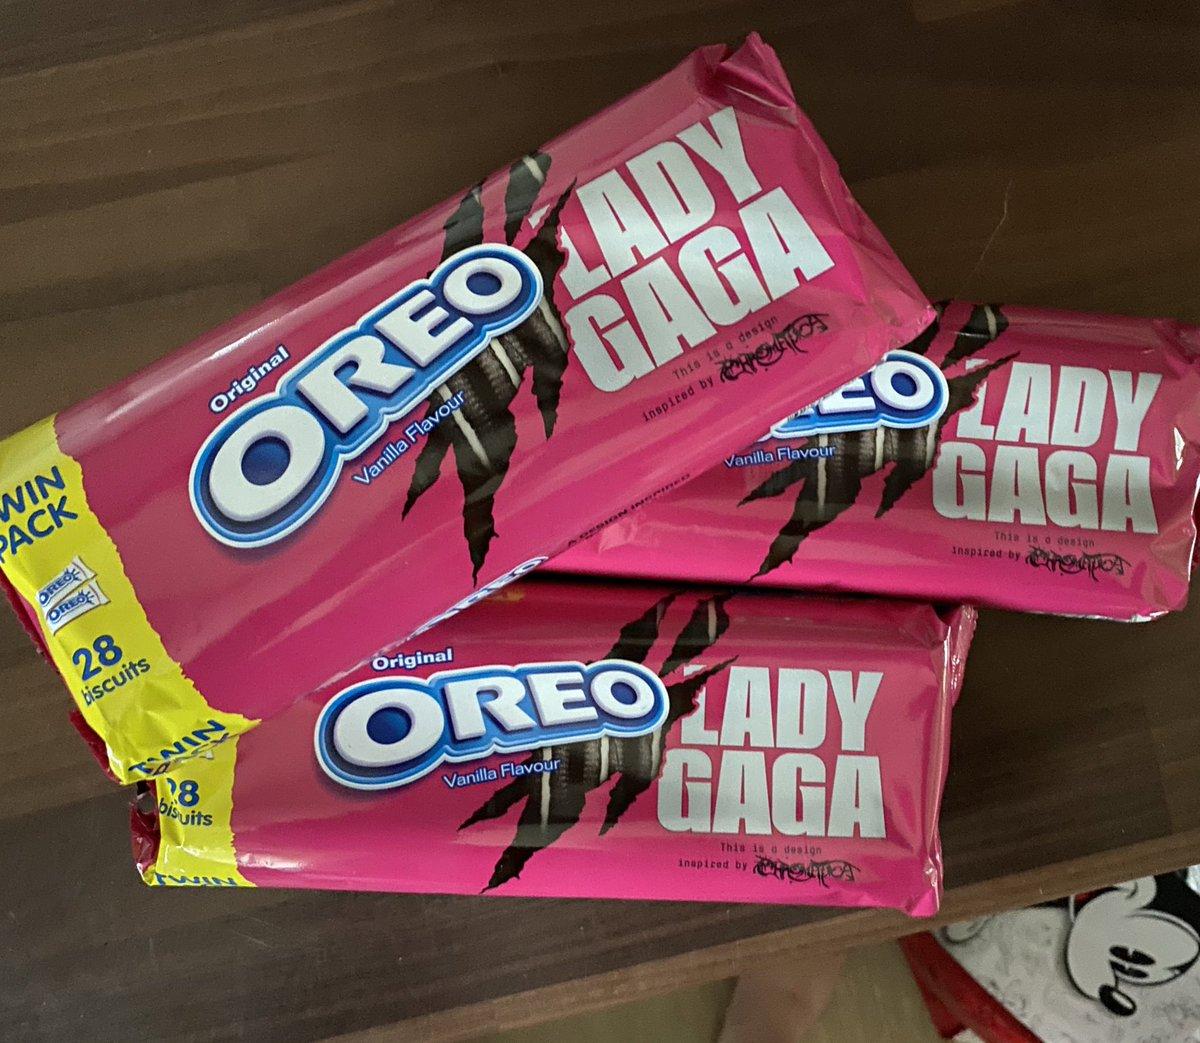 finally found them 😍😍😍 @ladygaga @OreoUki  (found them in Morrisons £1 for the twin pack) #LadyGaga #Chromatica